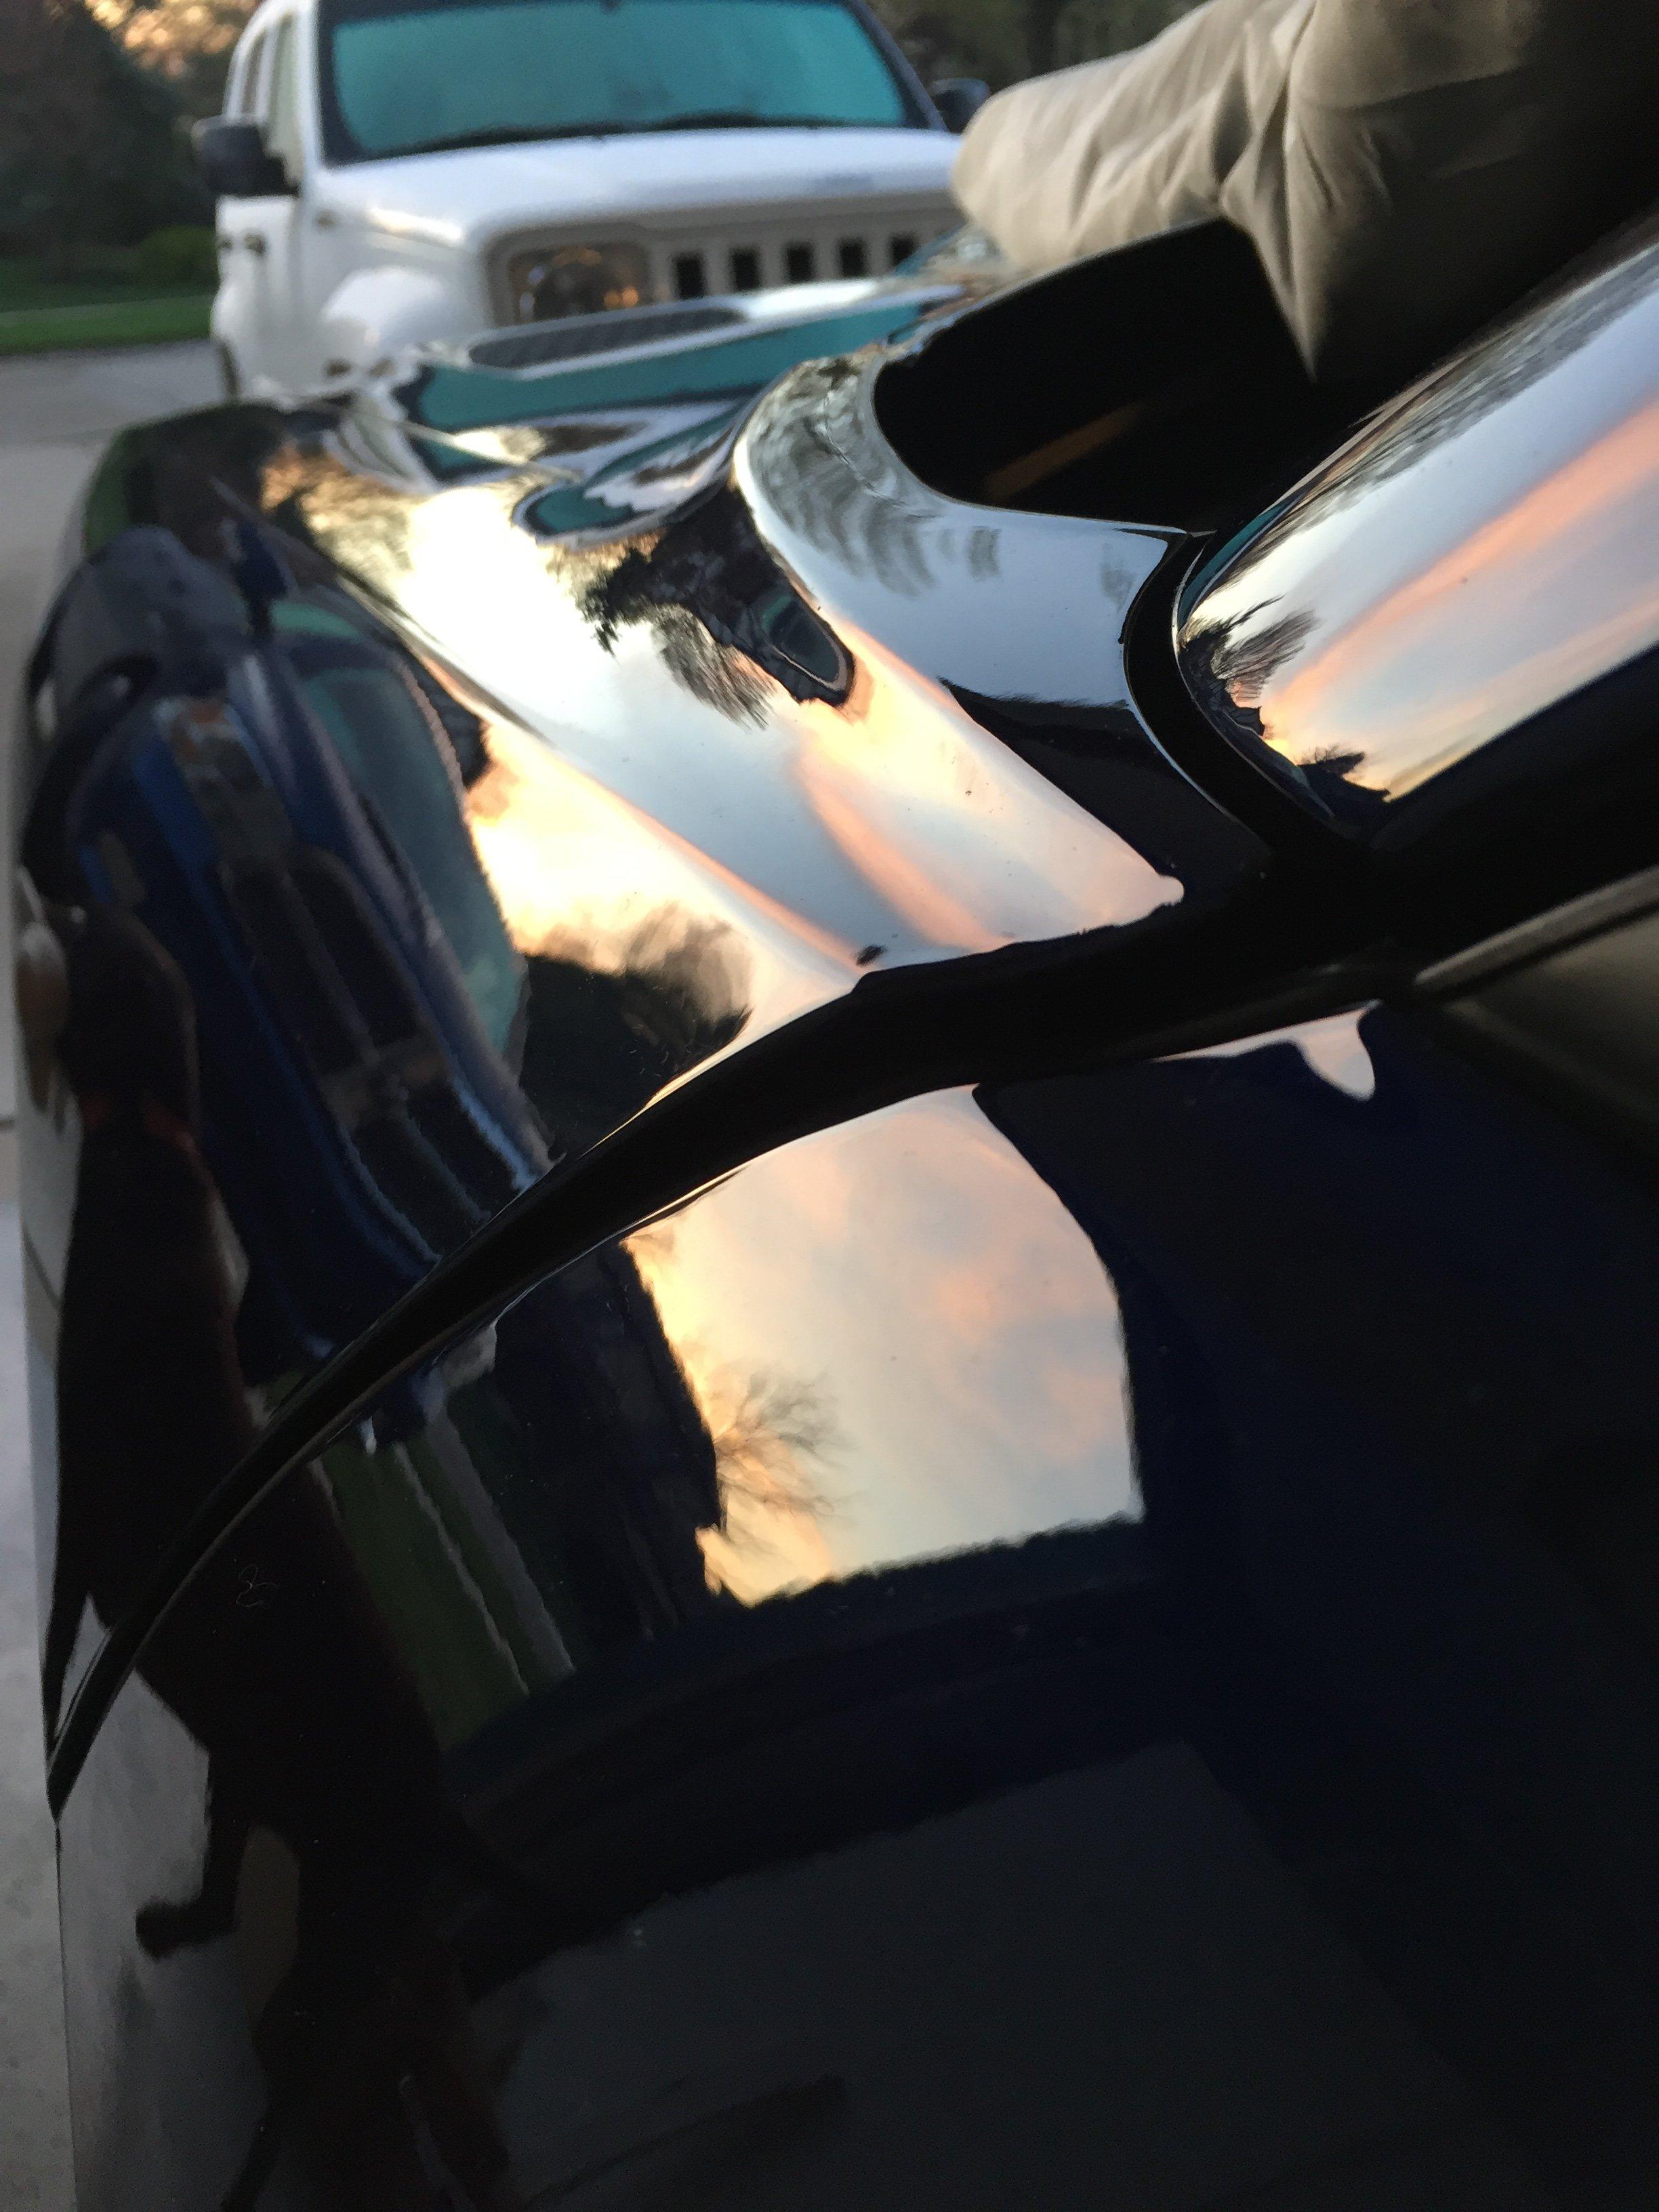 IMG_6697. & BAD FACTORY HOOD DOOR FENDER ALIGNMENT ON DRIVERS SIDE | SRT ...